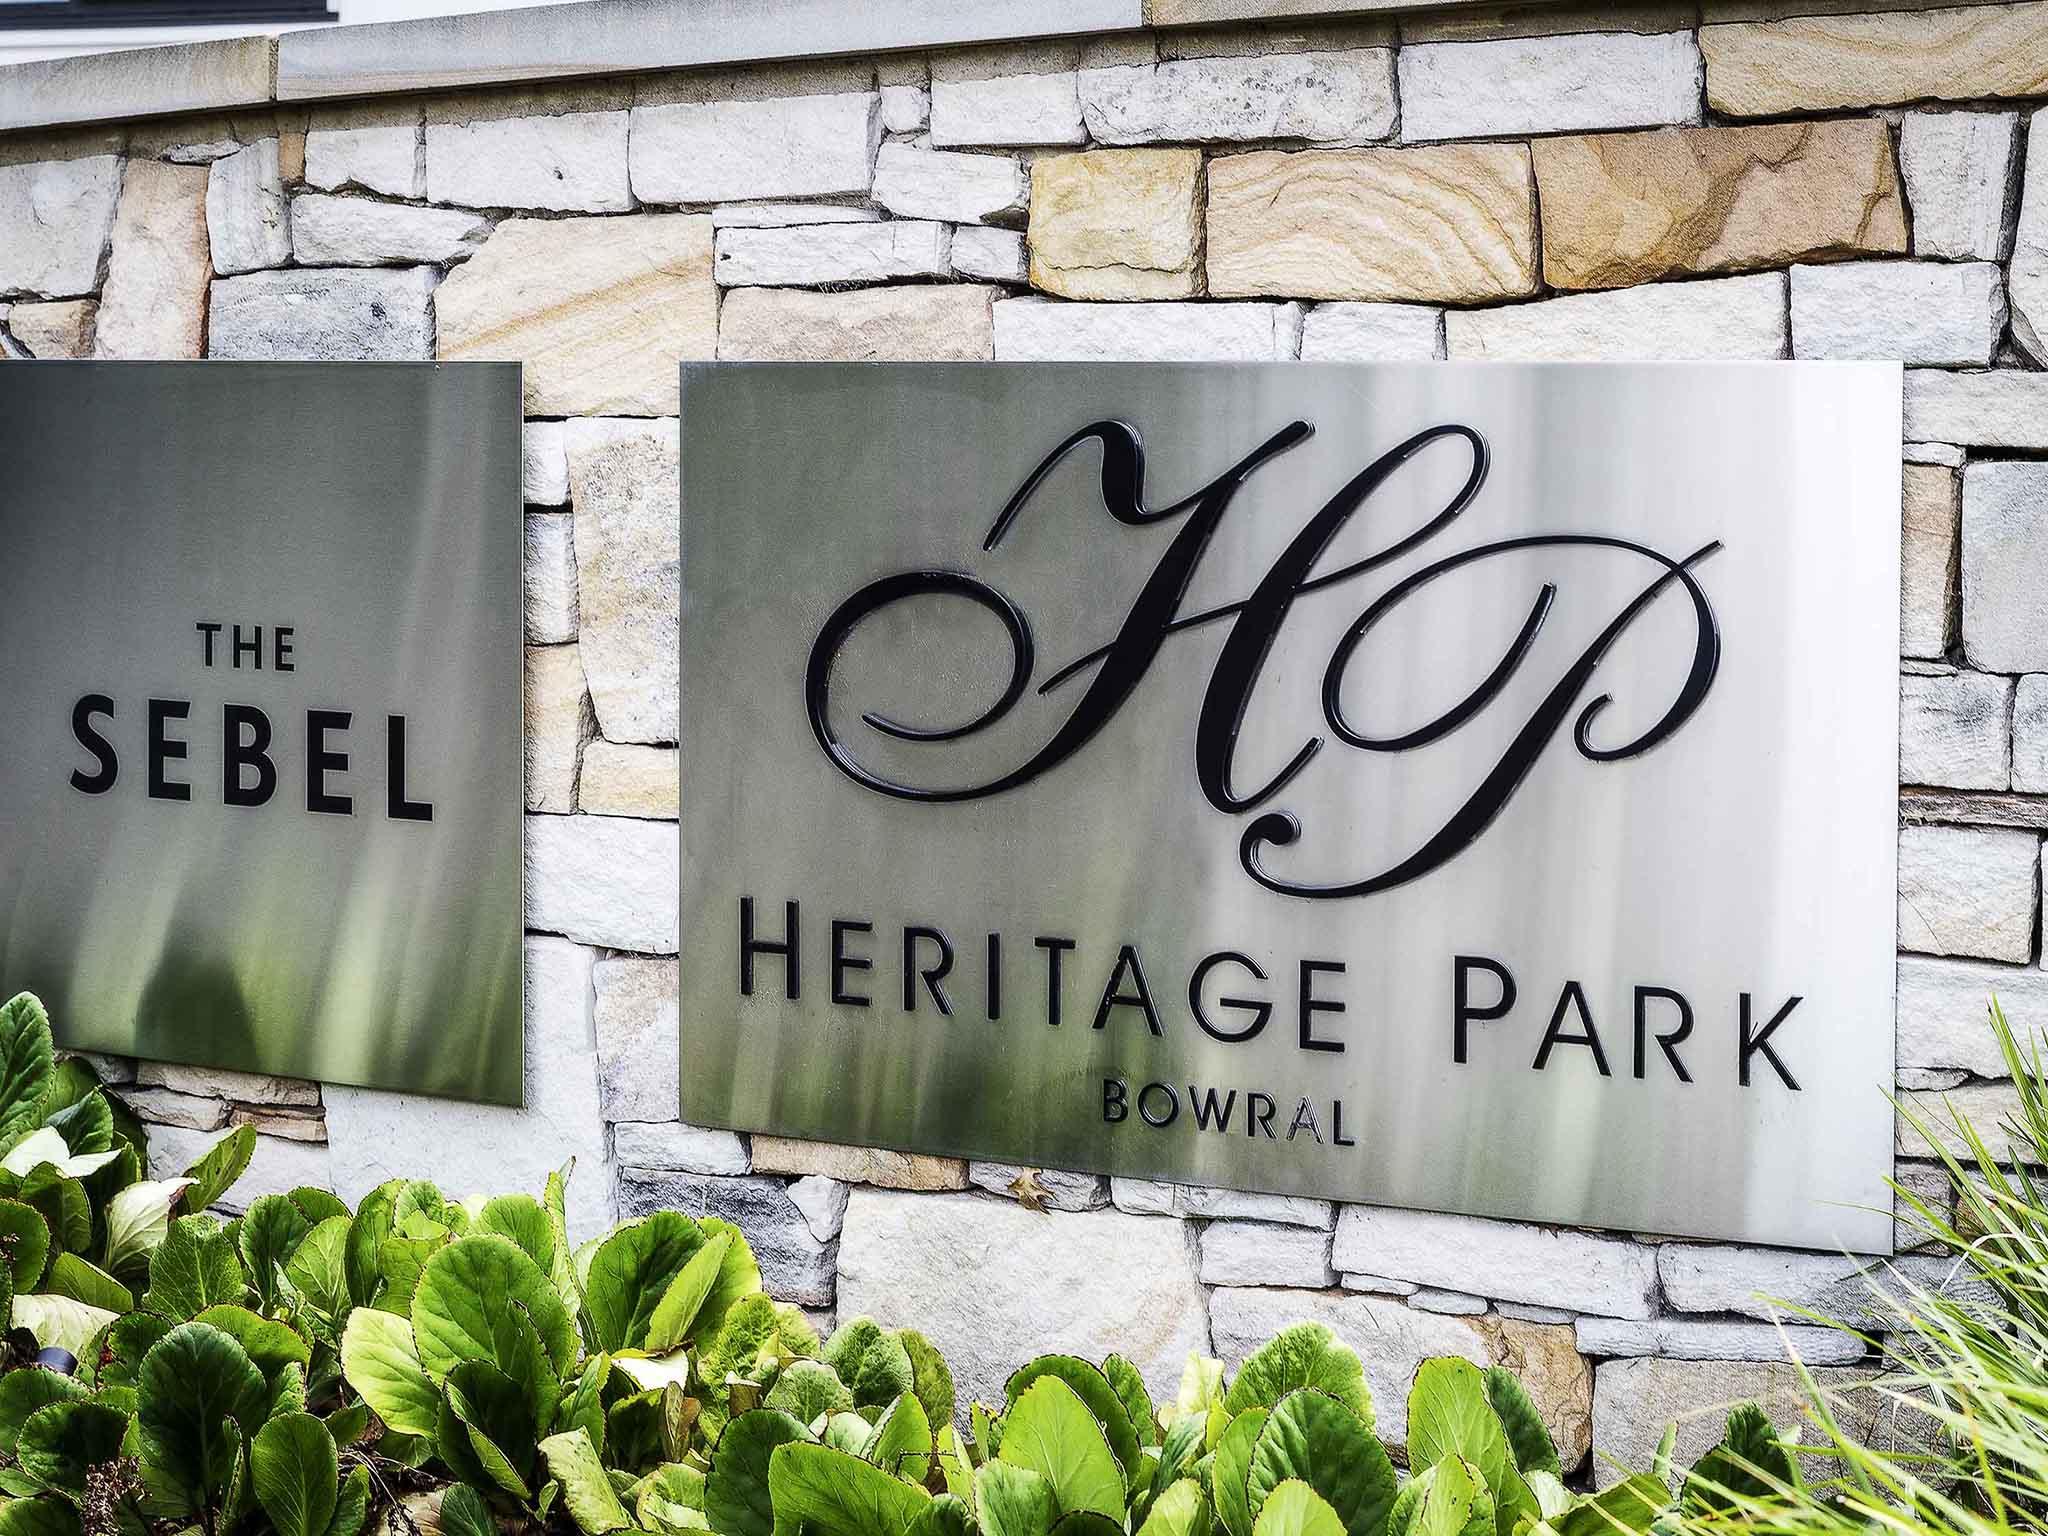 Hotel – The Sebel Bowral Heritage Park